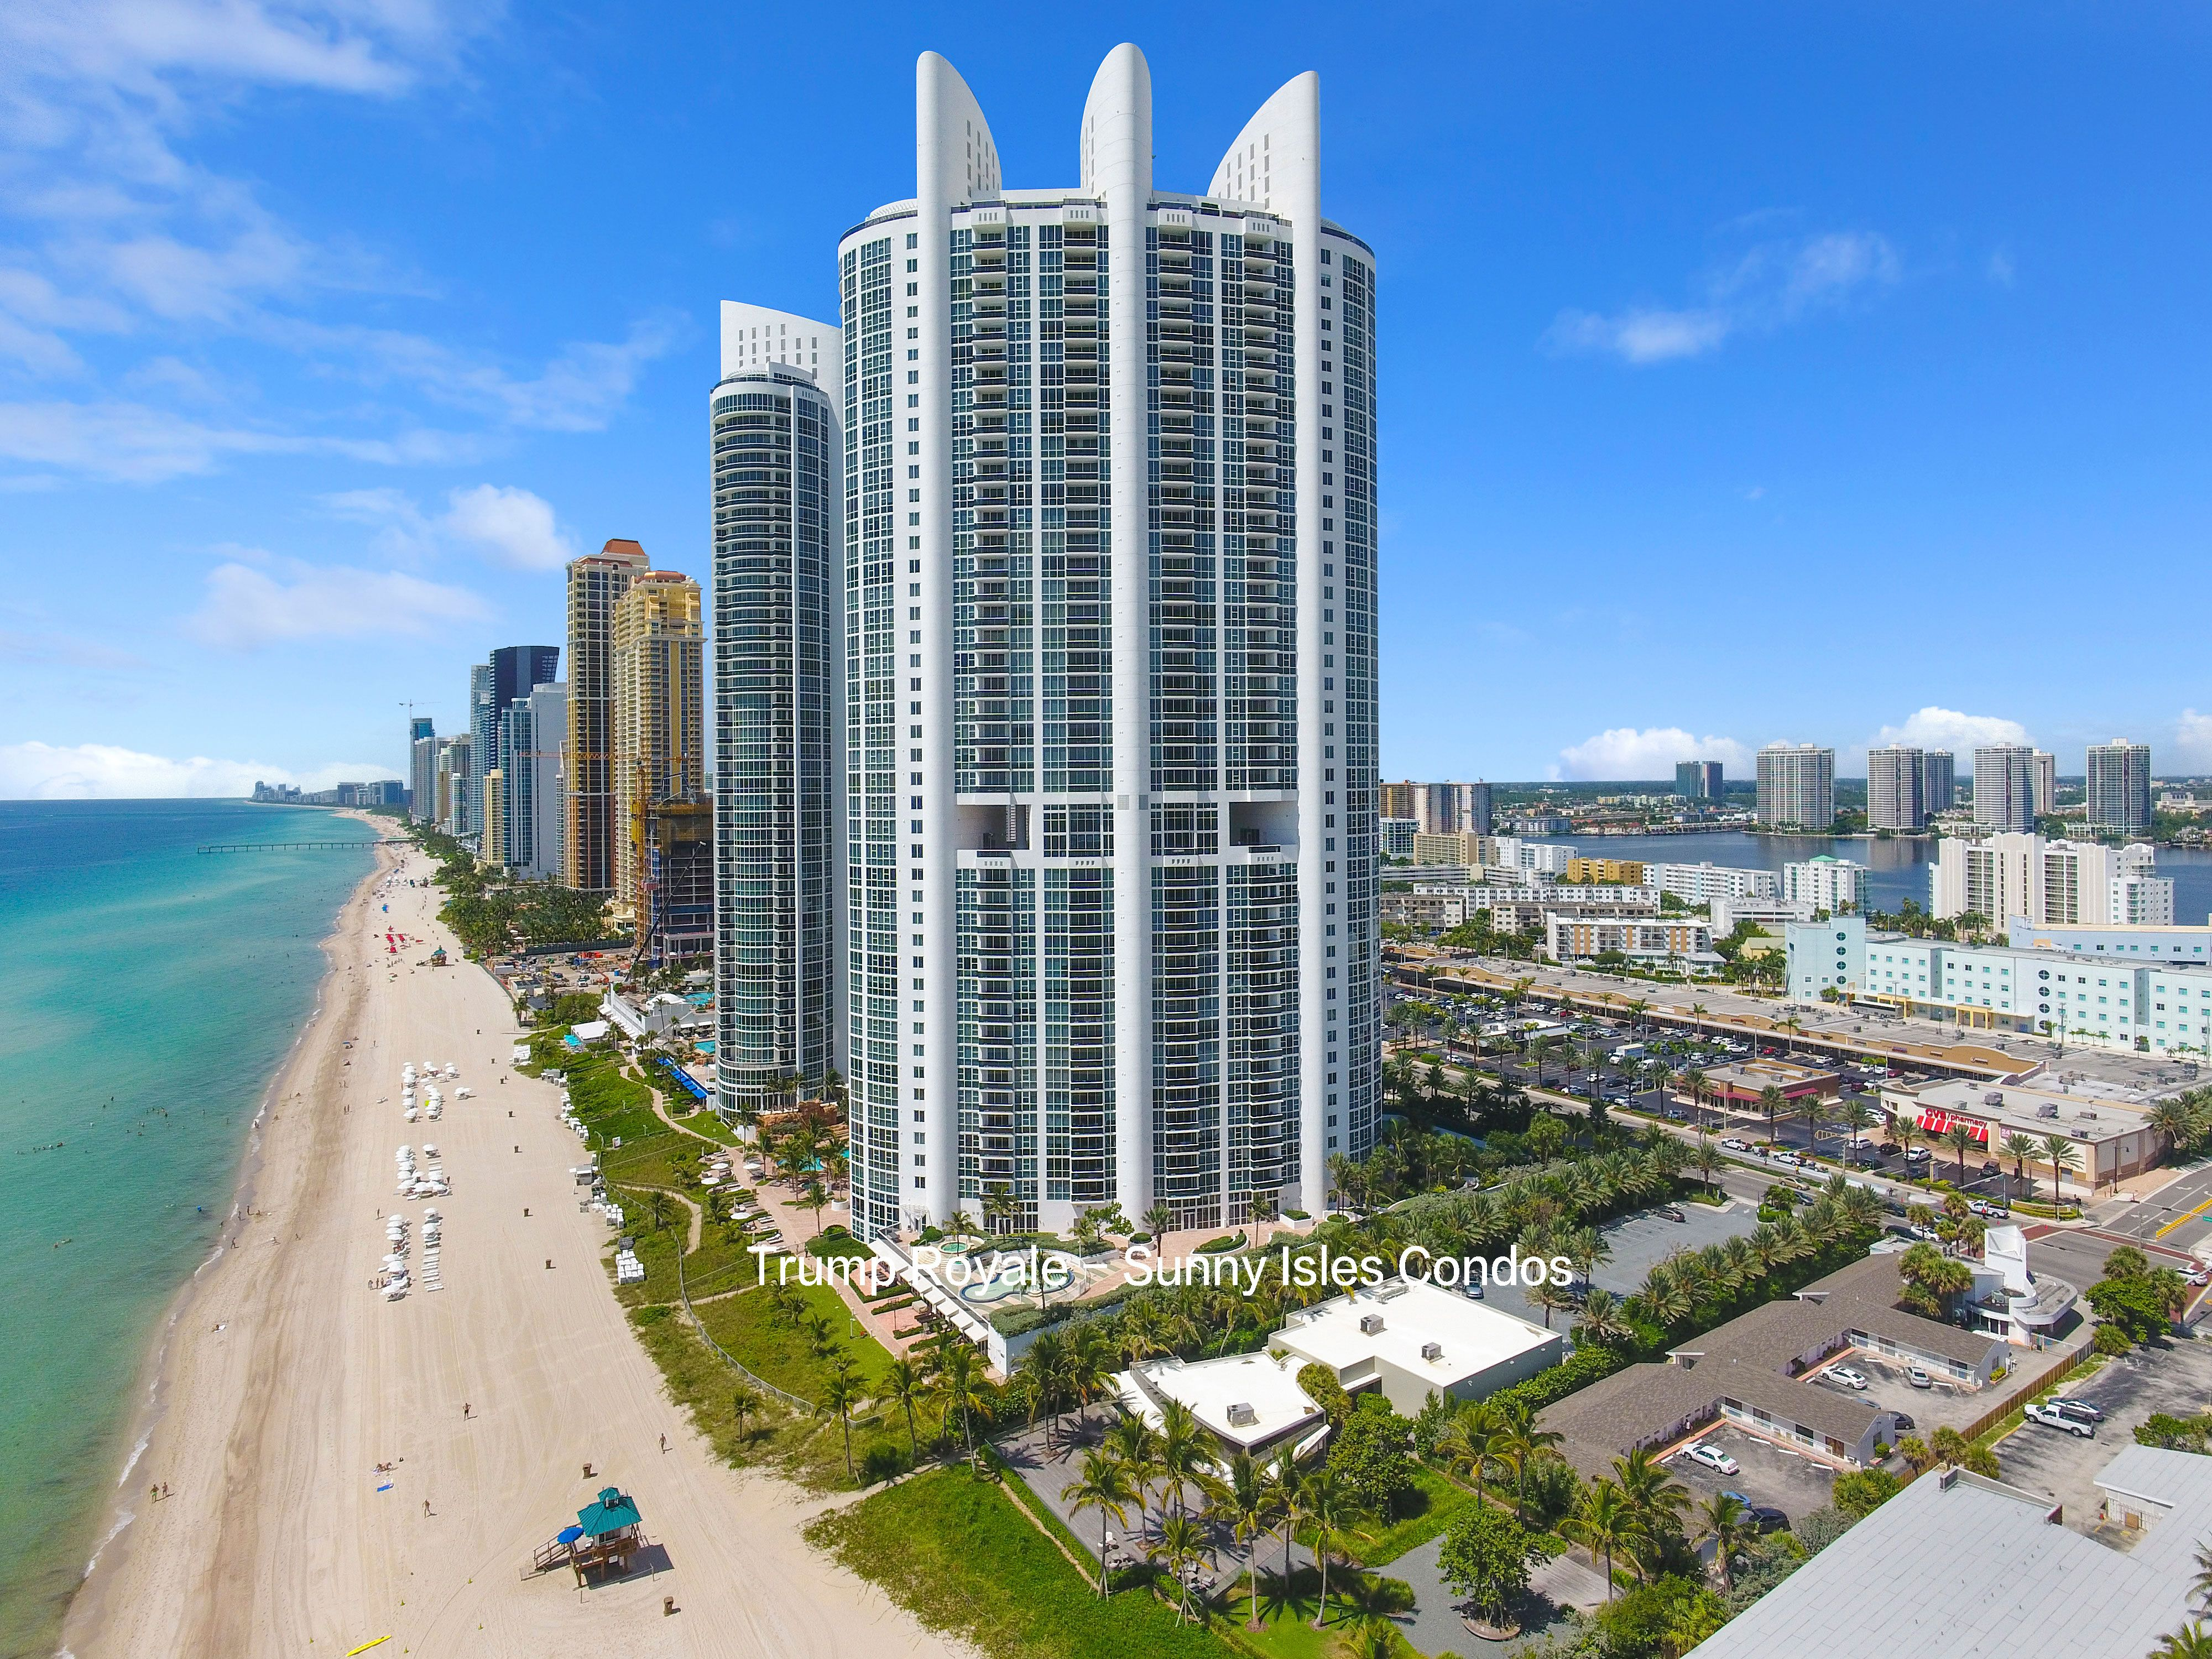 Trump Royale Condo 18201 Collins Ave Sunny Isles Beach Fl 33160 Sunny Isles Condos Sunny Isles Beach Sunny Isles Sunny Isles Beach Florida